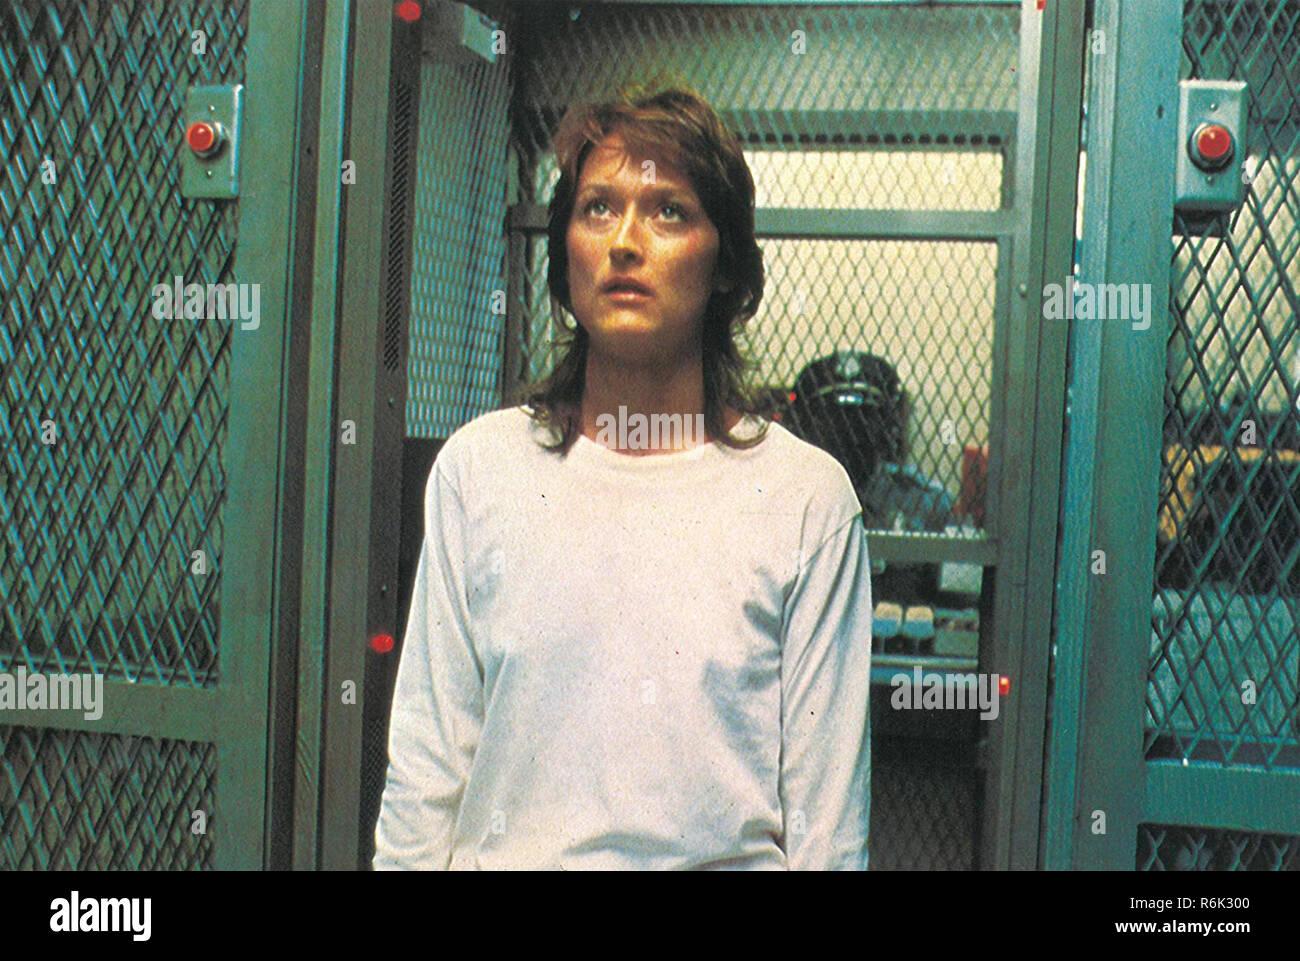 SILKWOOD 1983 20th Century Fox Film con Meryl Streep Imagen De Stock